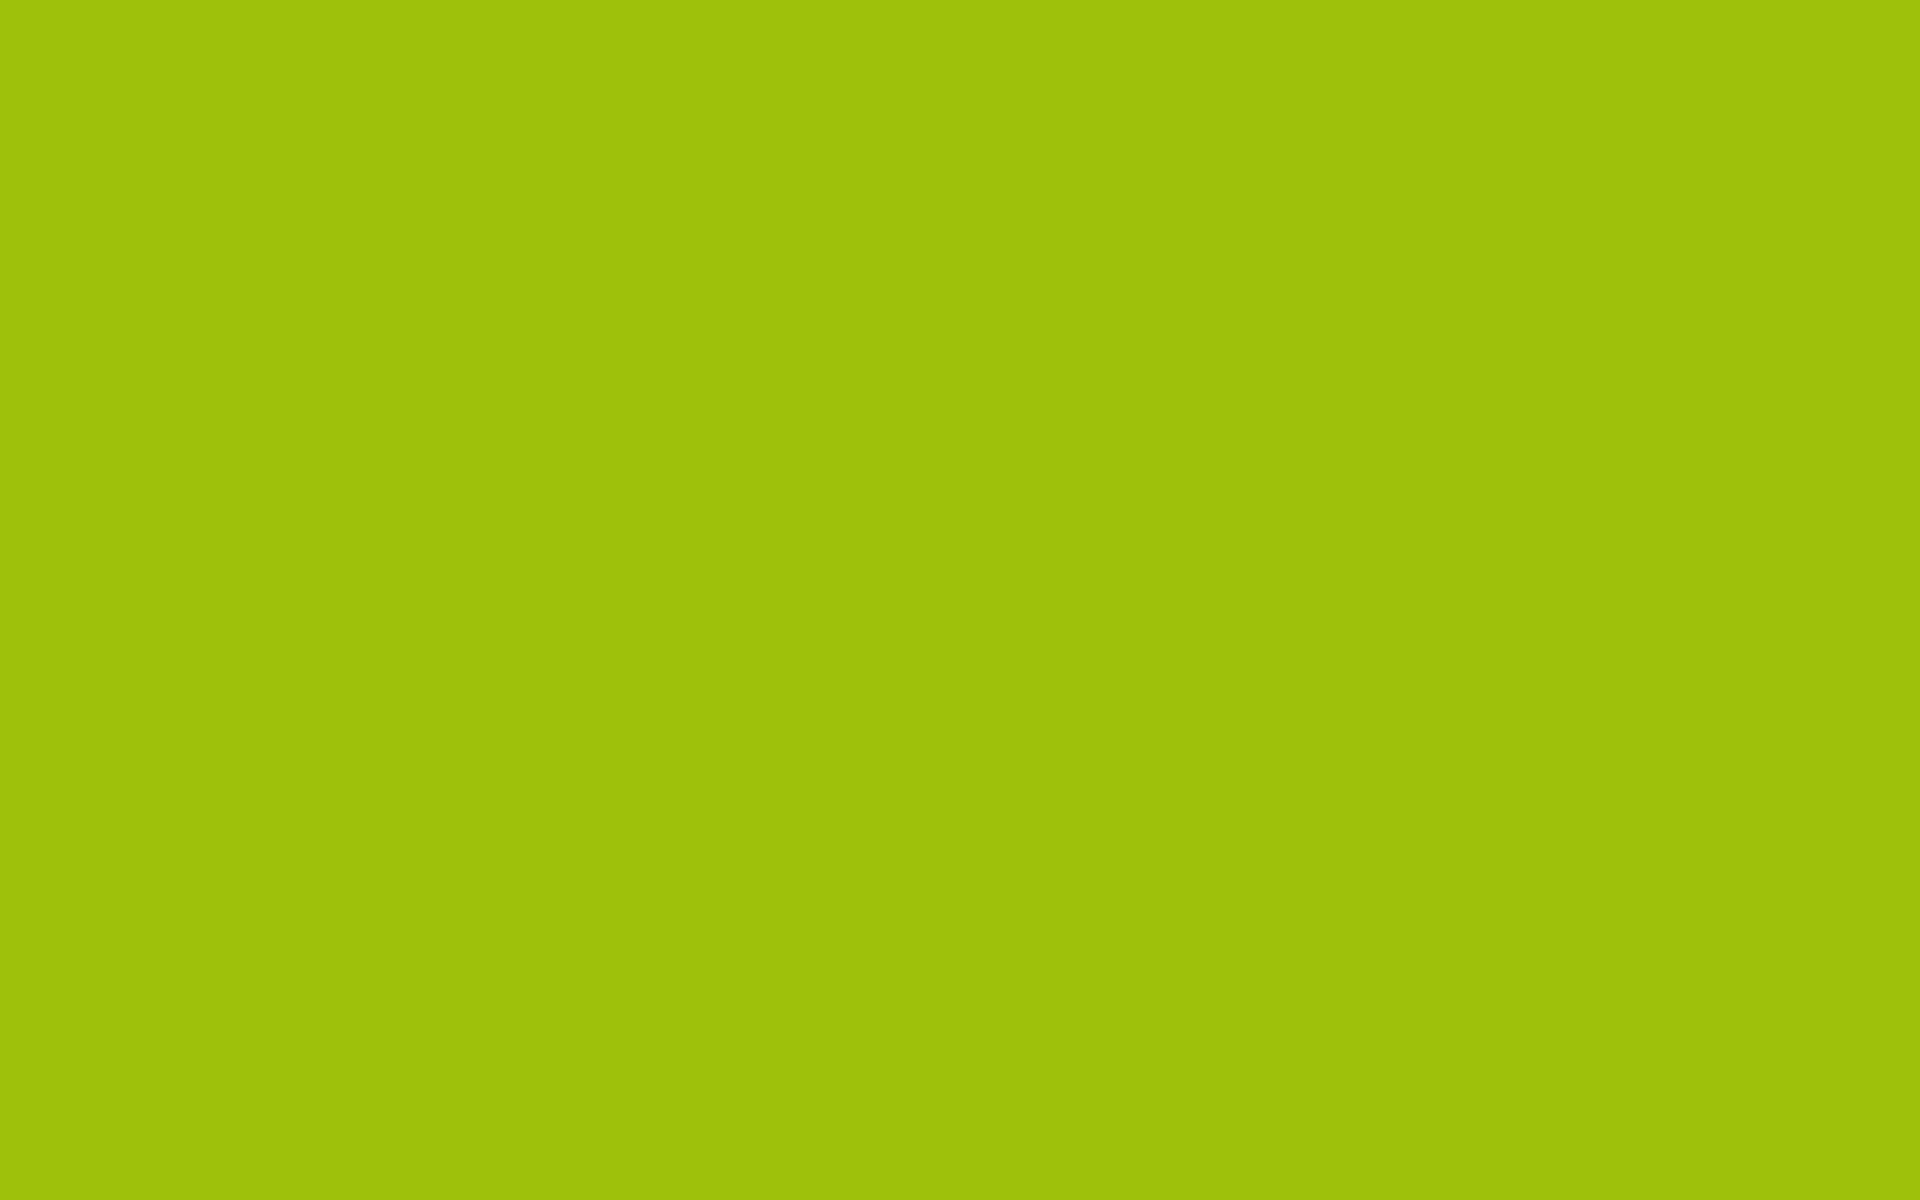 1920x1200 Limerick Solid Color Background